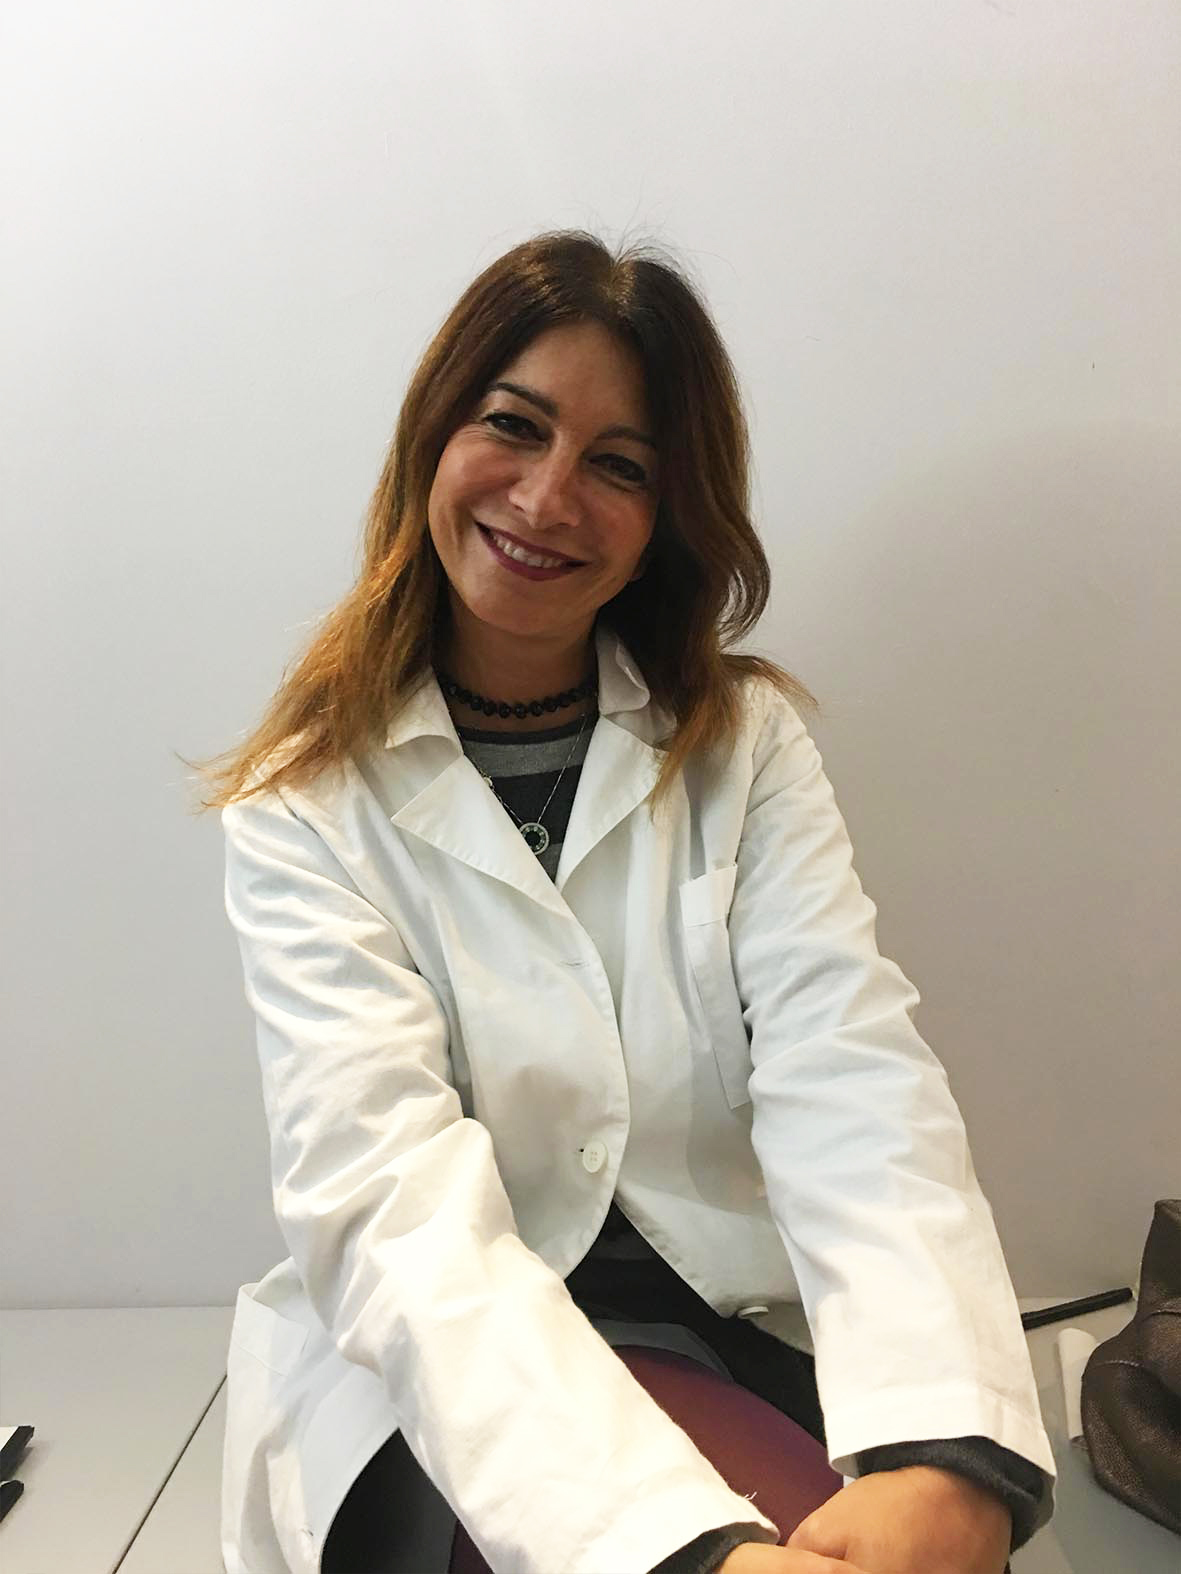 Rita MANCINI